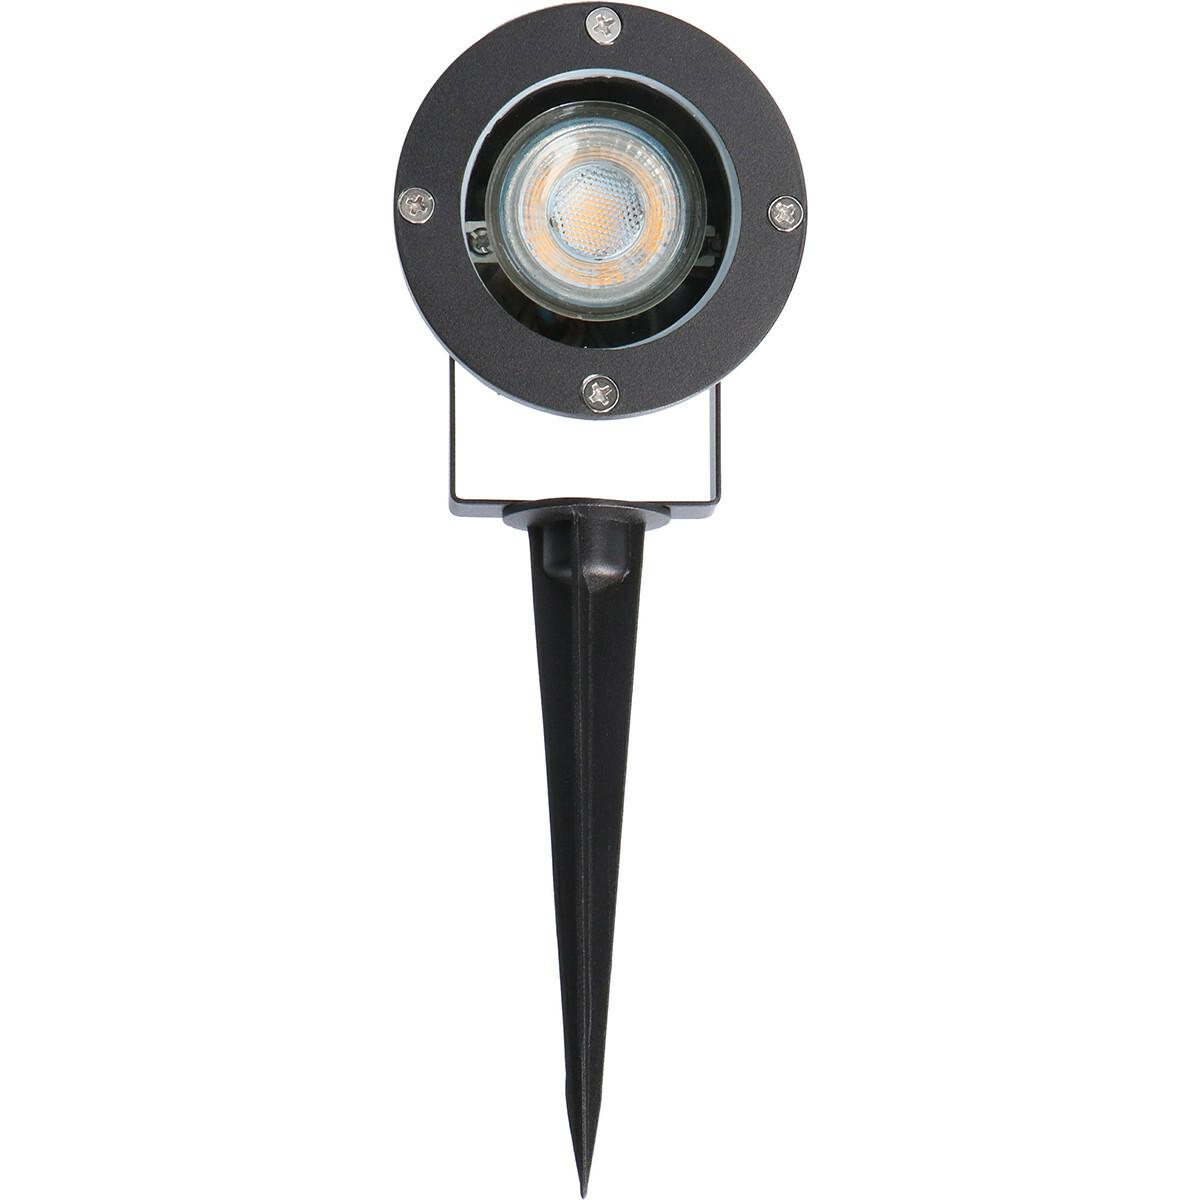 PHILIPS - Prikspot met Stekker - CorePro 830 36D - Sanola Urbun - GU10 Fitting - Dimbaar - 5W - Warm